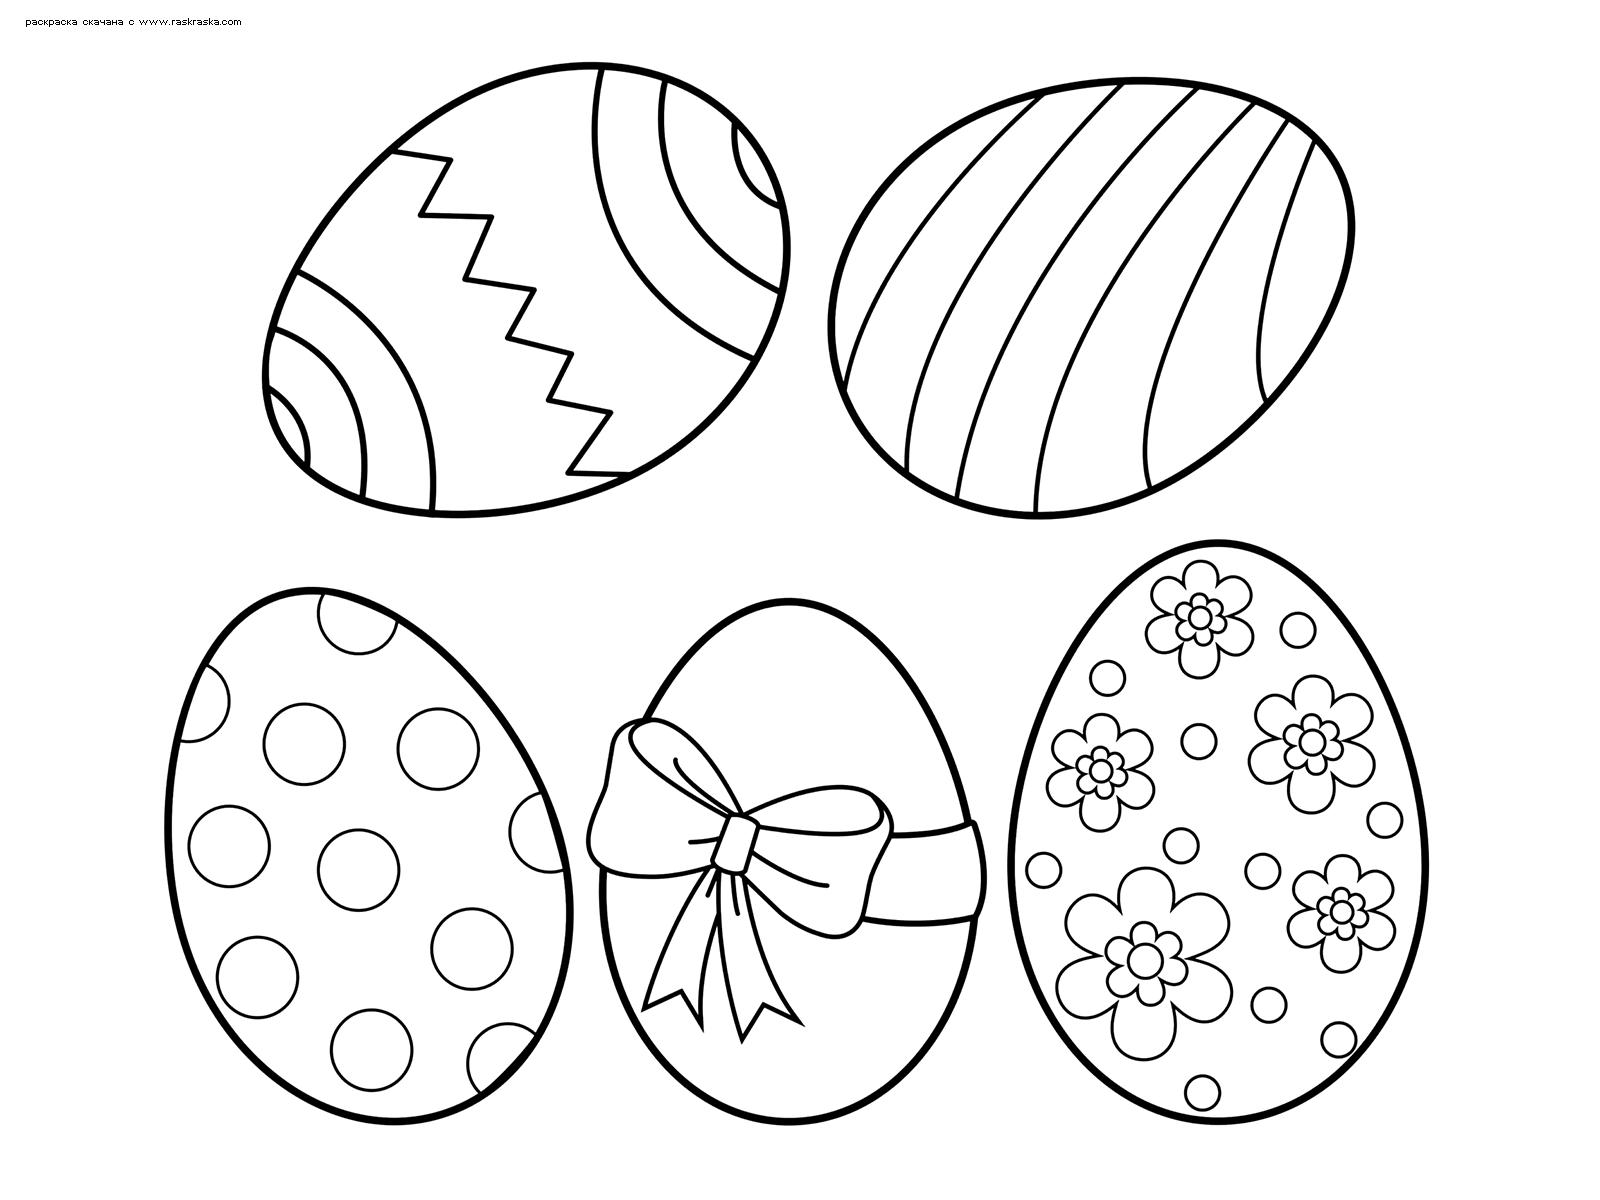 Раскраска Пасхальные яйца. Раскраска яйца, пасха